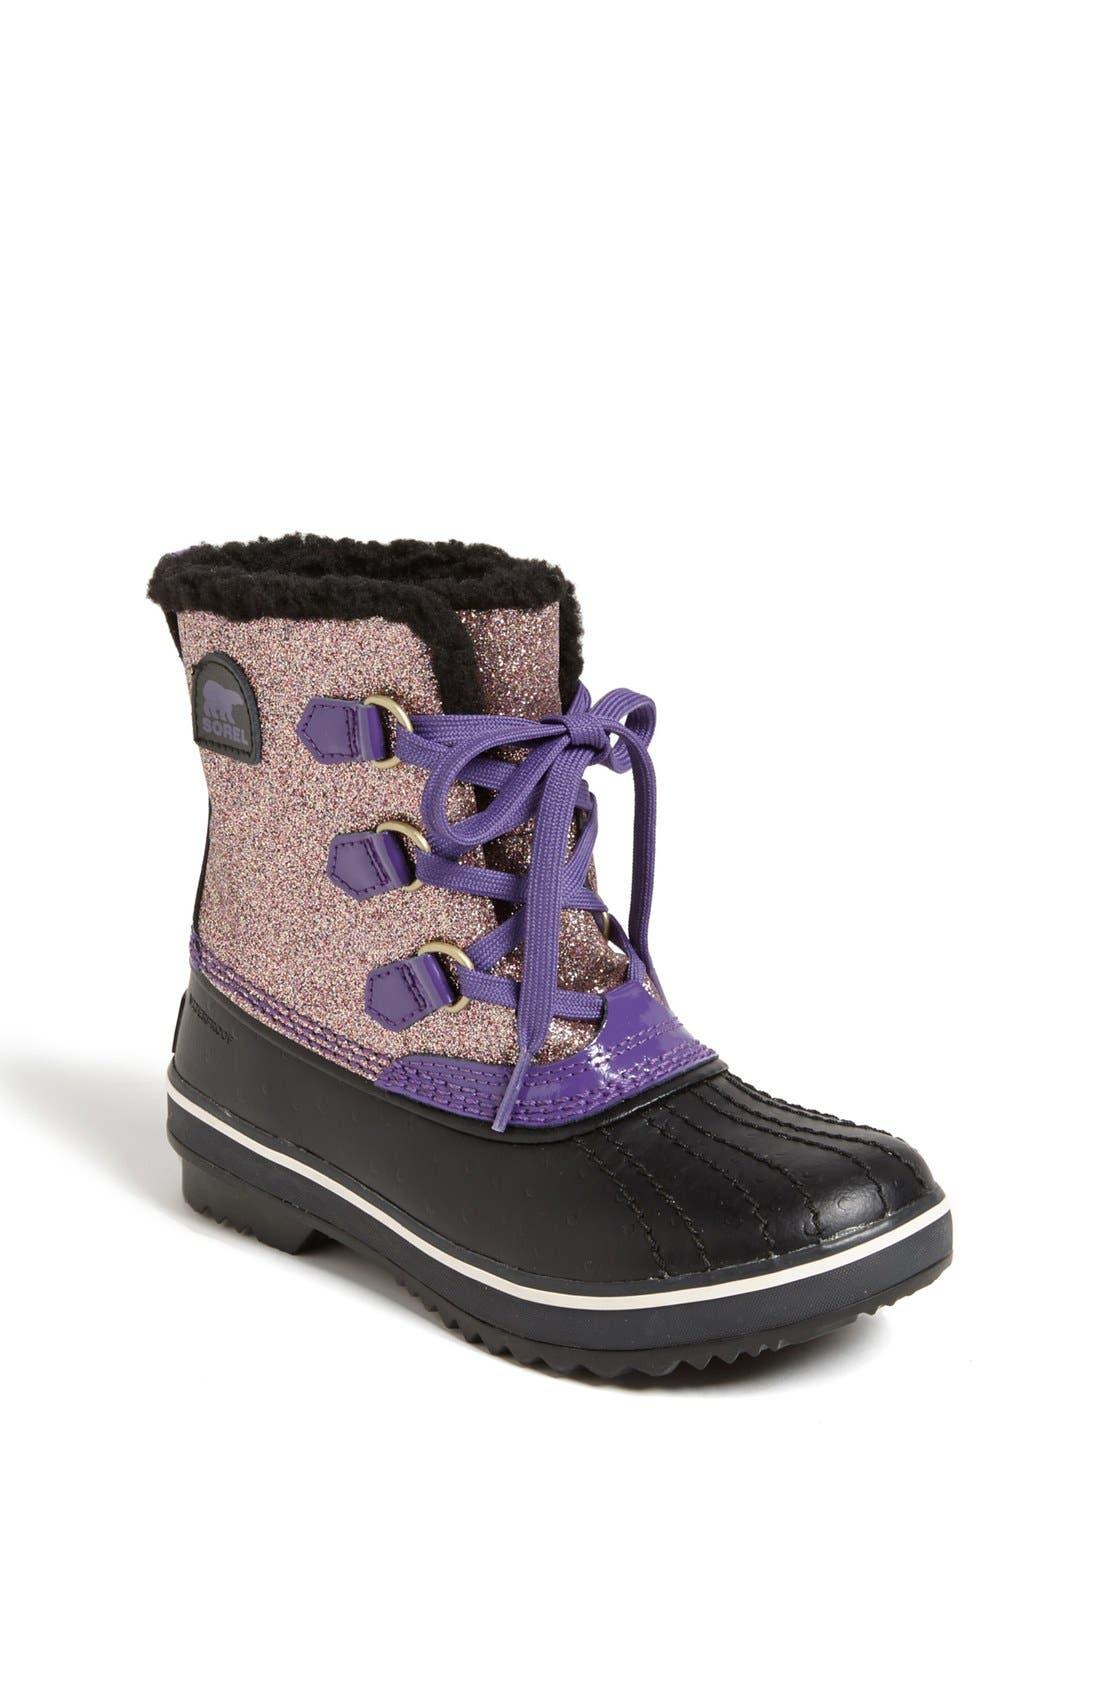 Main Image - SOREL 'Youth Tivoli - Glitter' Boot (Little Kid & Big Kid)